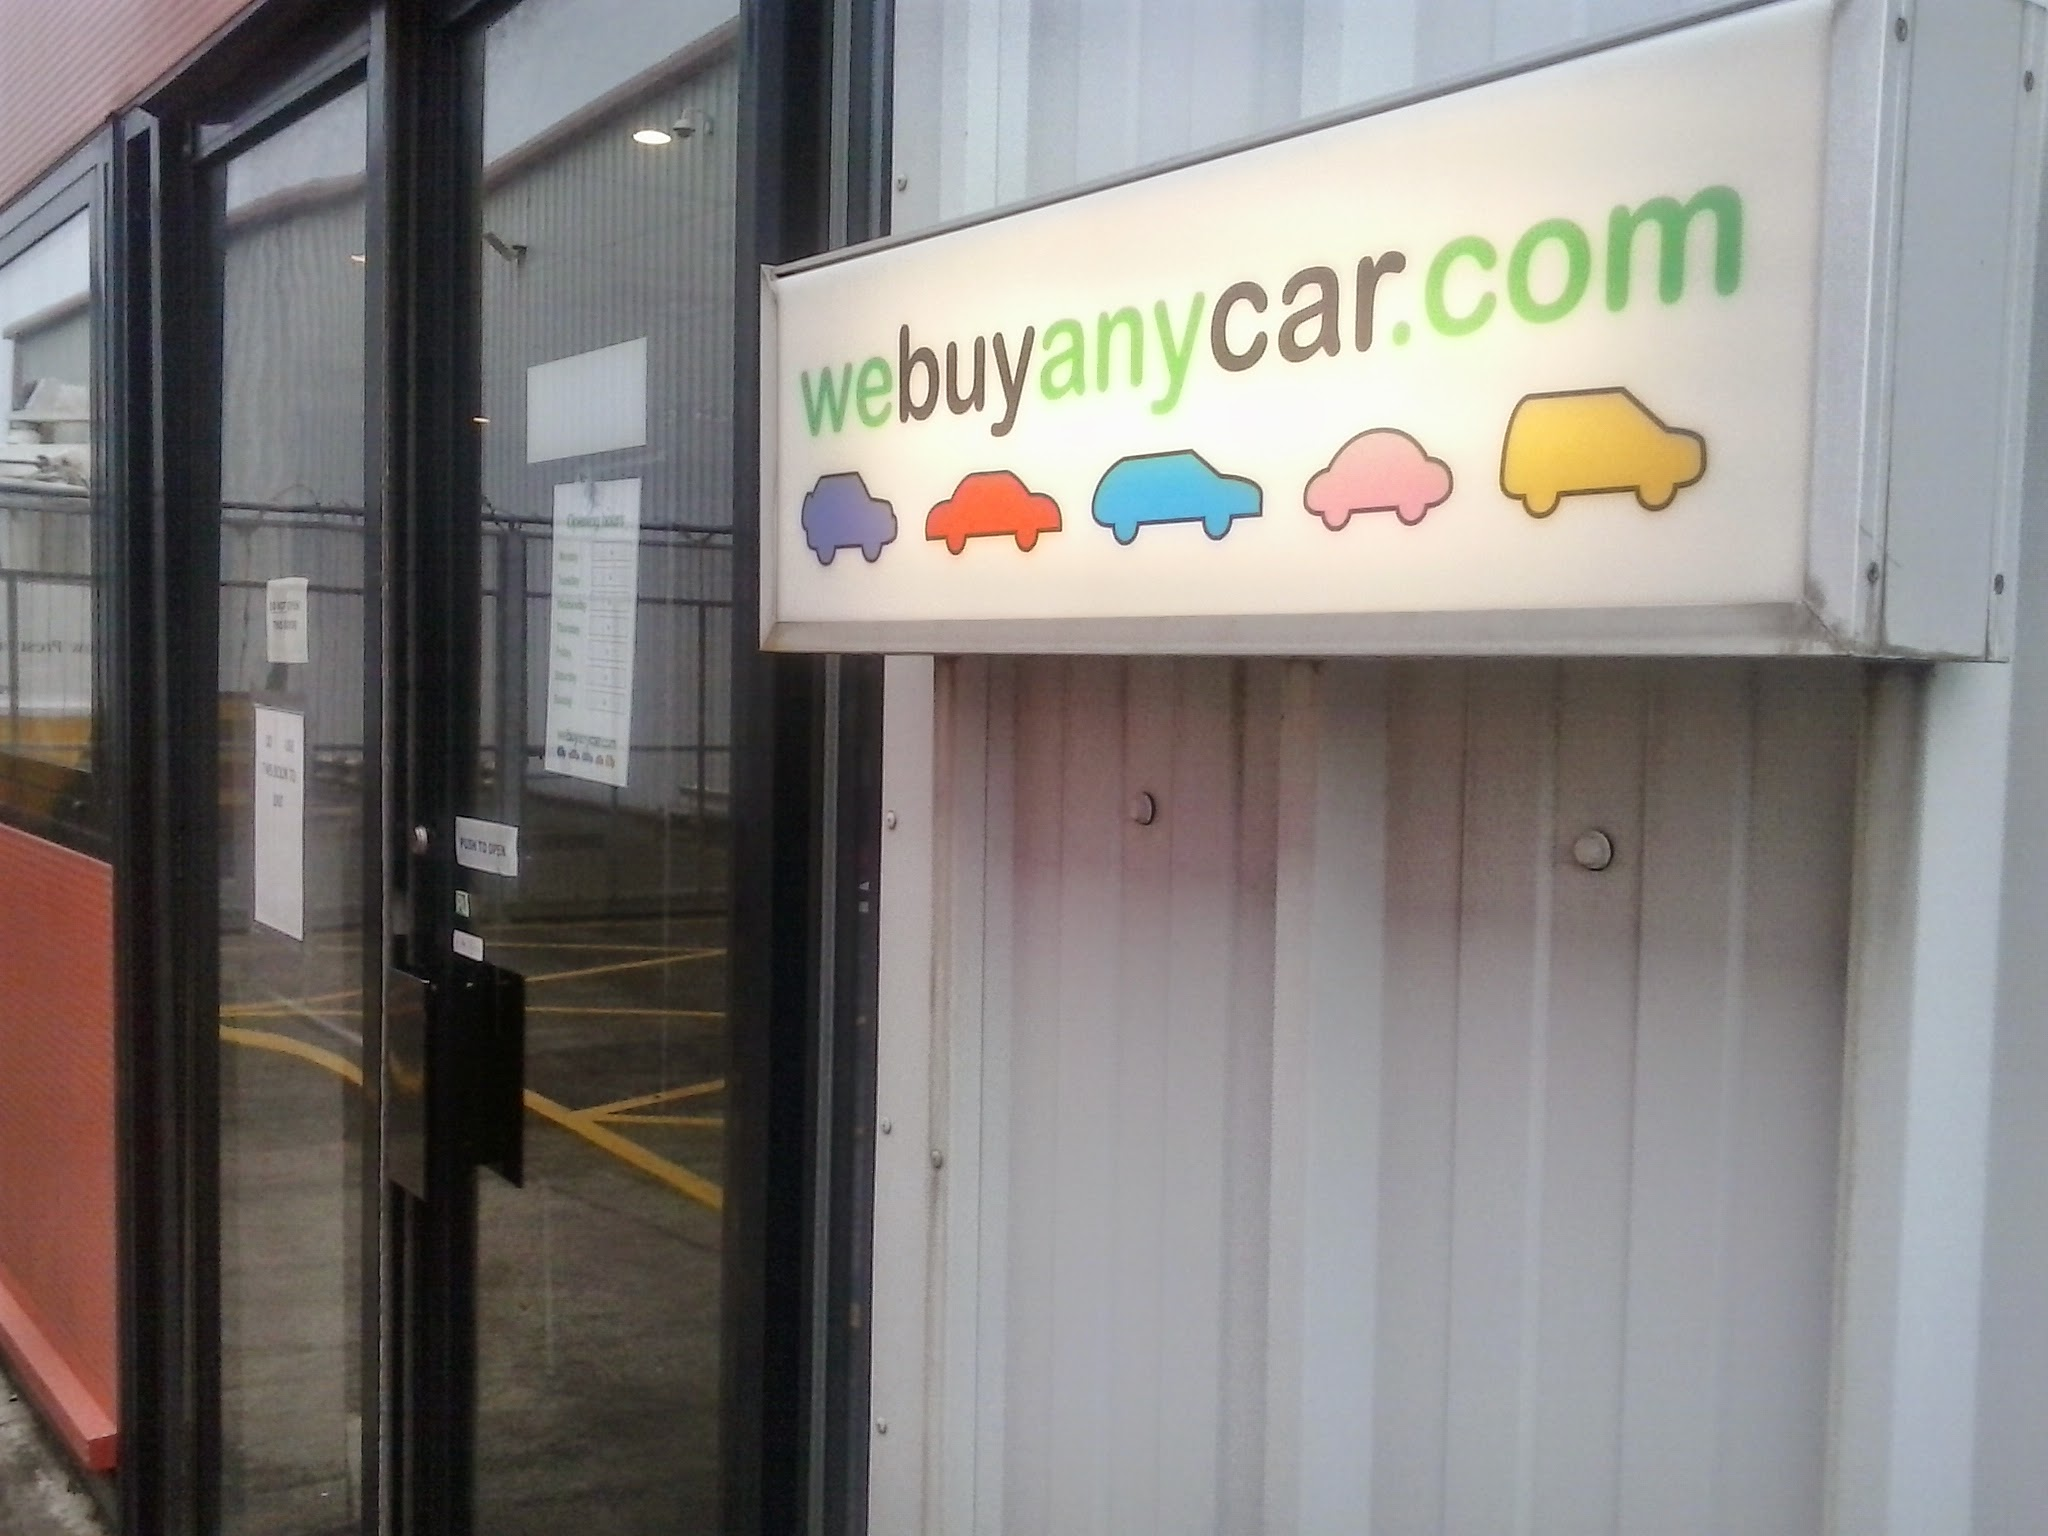 We Buy Any Car Ayr, Ayr